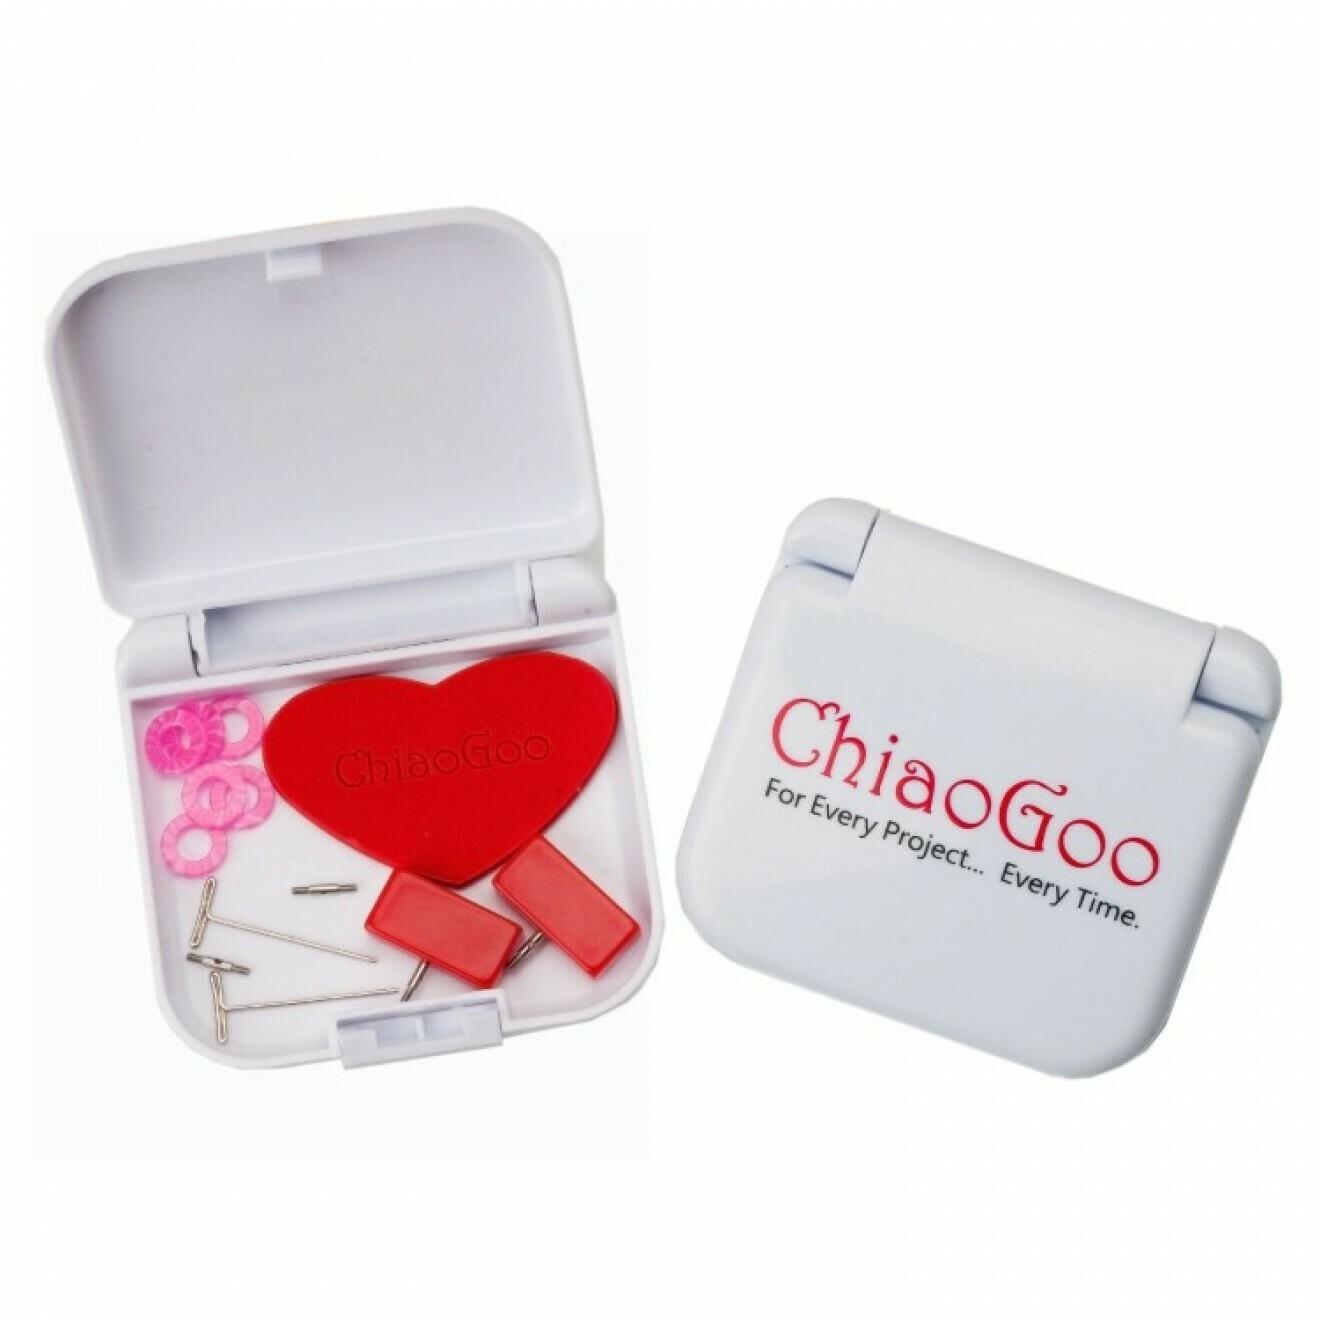 ChiaoGoo mini accessory / tools set / kit